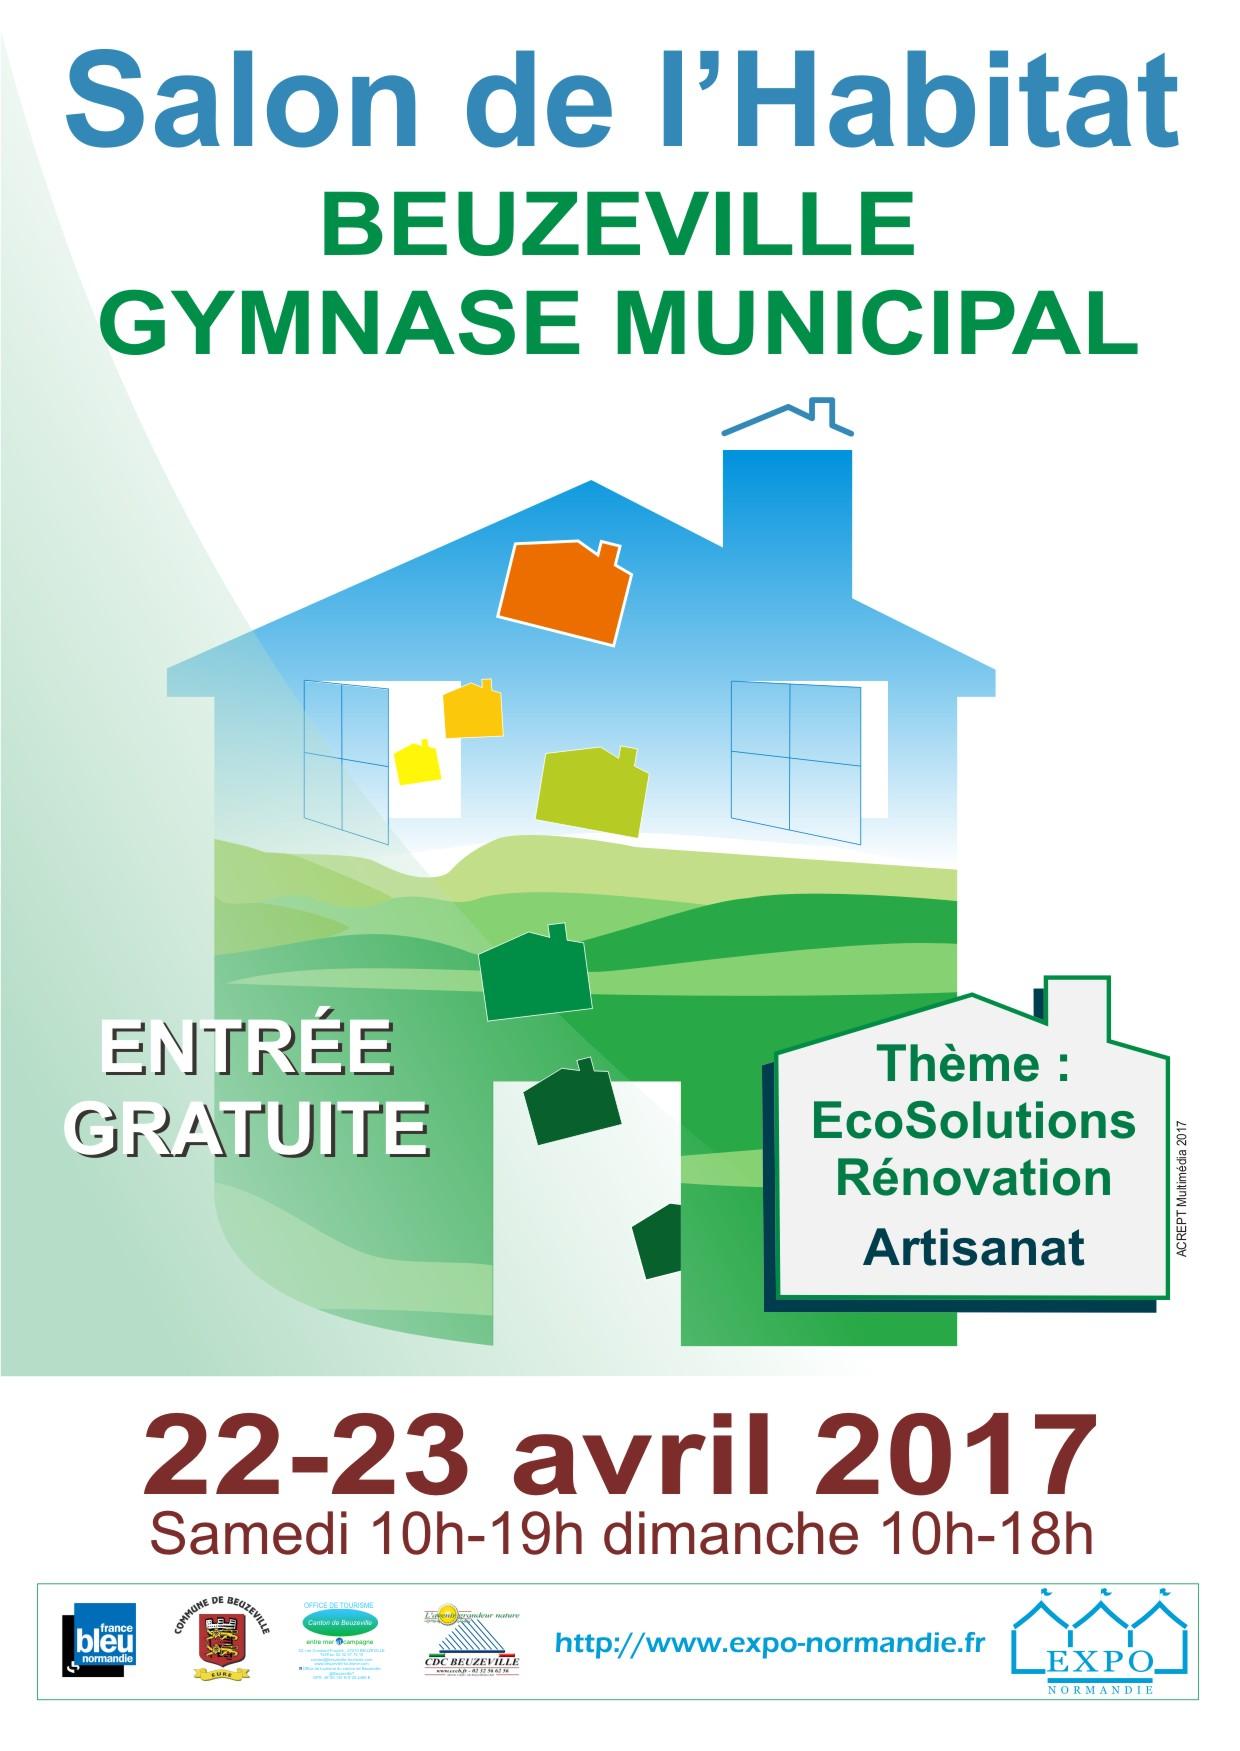 SALON DE L'HABITAT DE BEUZEVILLE 22 & 23 AVRIL 2017